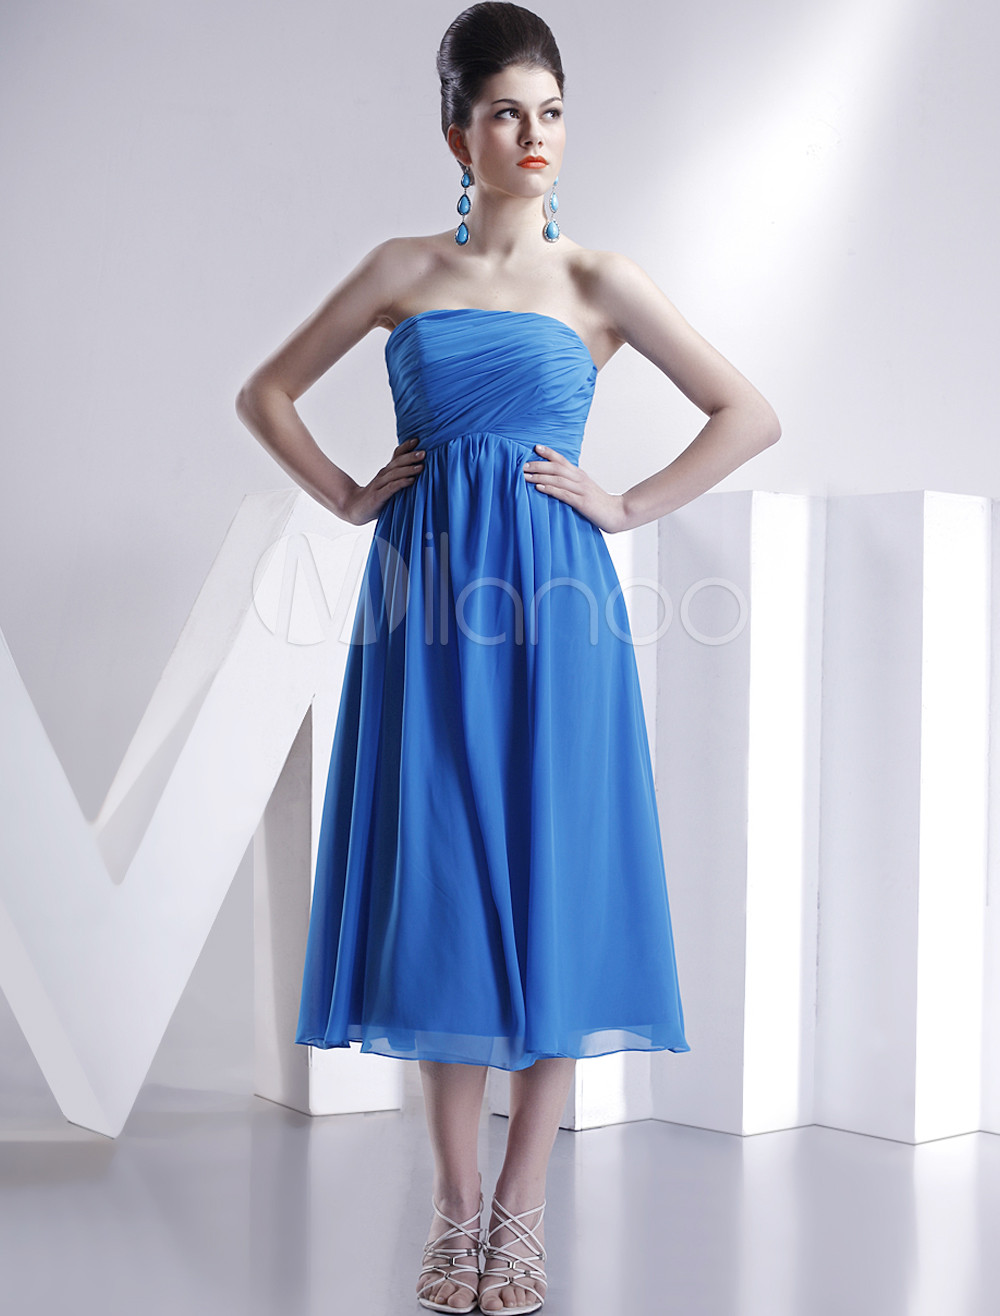 Royal Blue Strapless Empire Waist Satin Chiffon Summer Bridesmaid Homecoming Dress